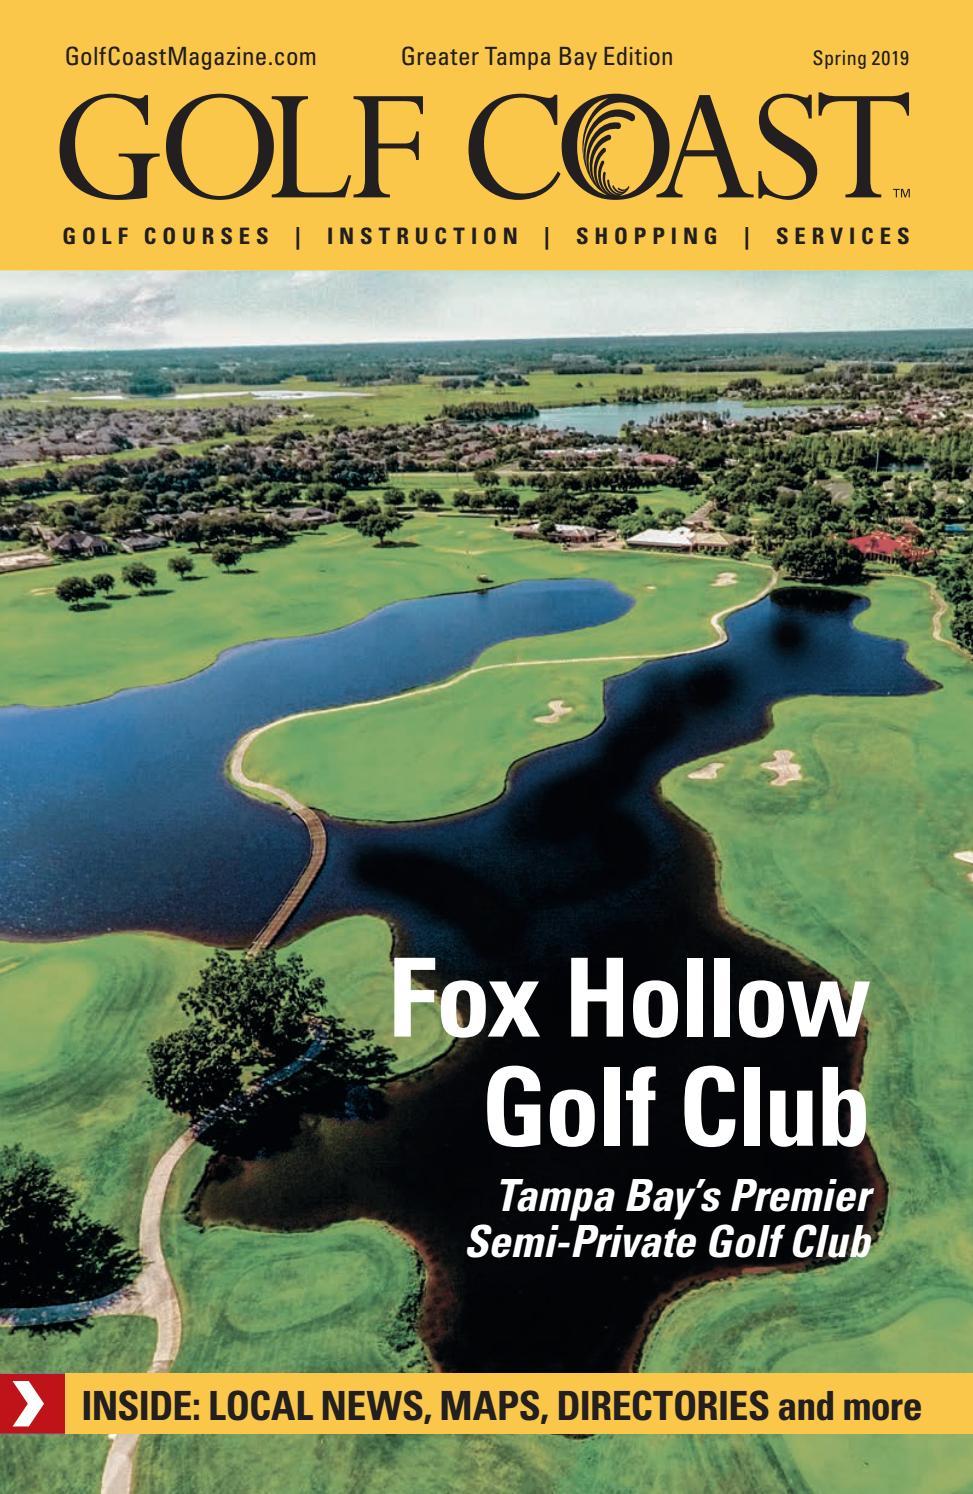 Tampa bay city amateur golf tournament